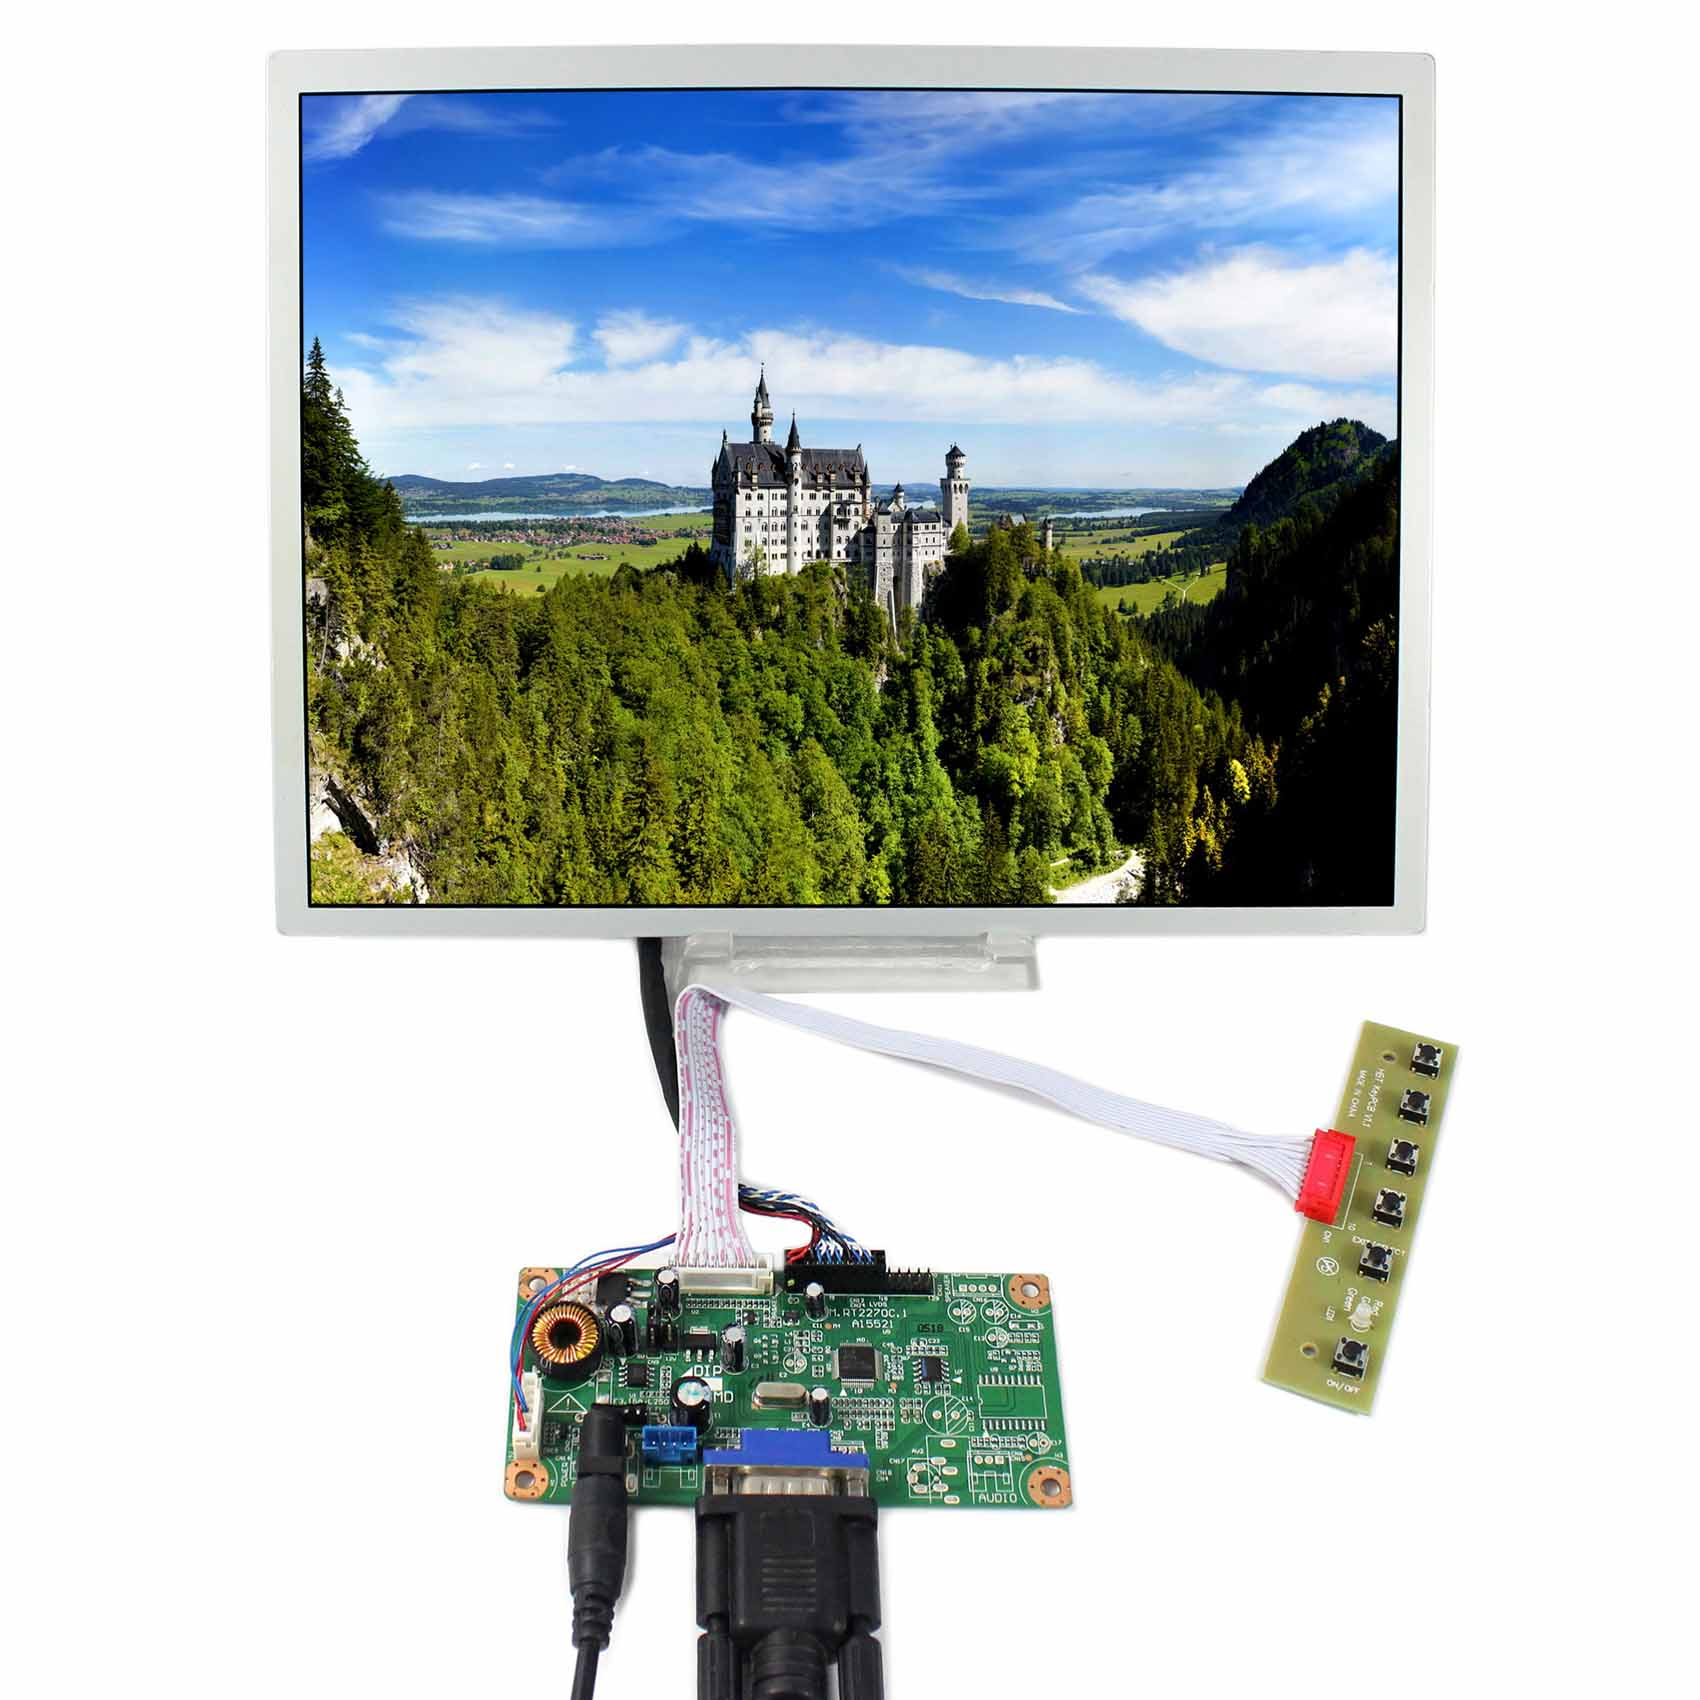 LQ121S1LG75 800x600 12.1inch LCD Screen+VGA LCD Controller Board RT2270CLQ121S1LG75 800x600 12.1inch LCD Screen+VGA LCD Controller Board RT2270C